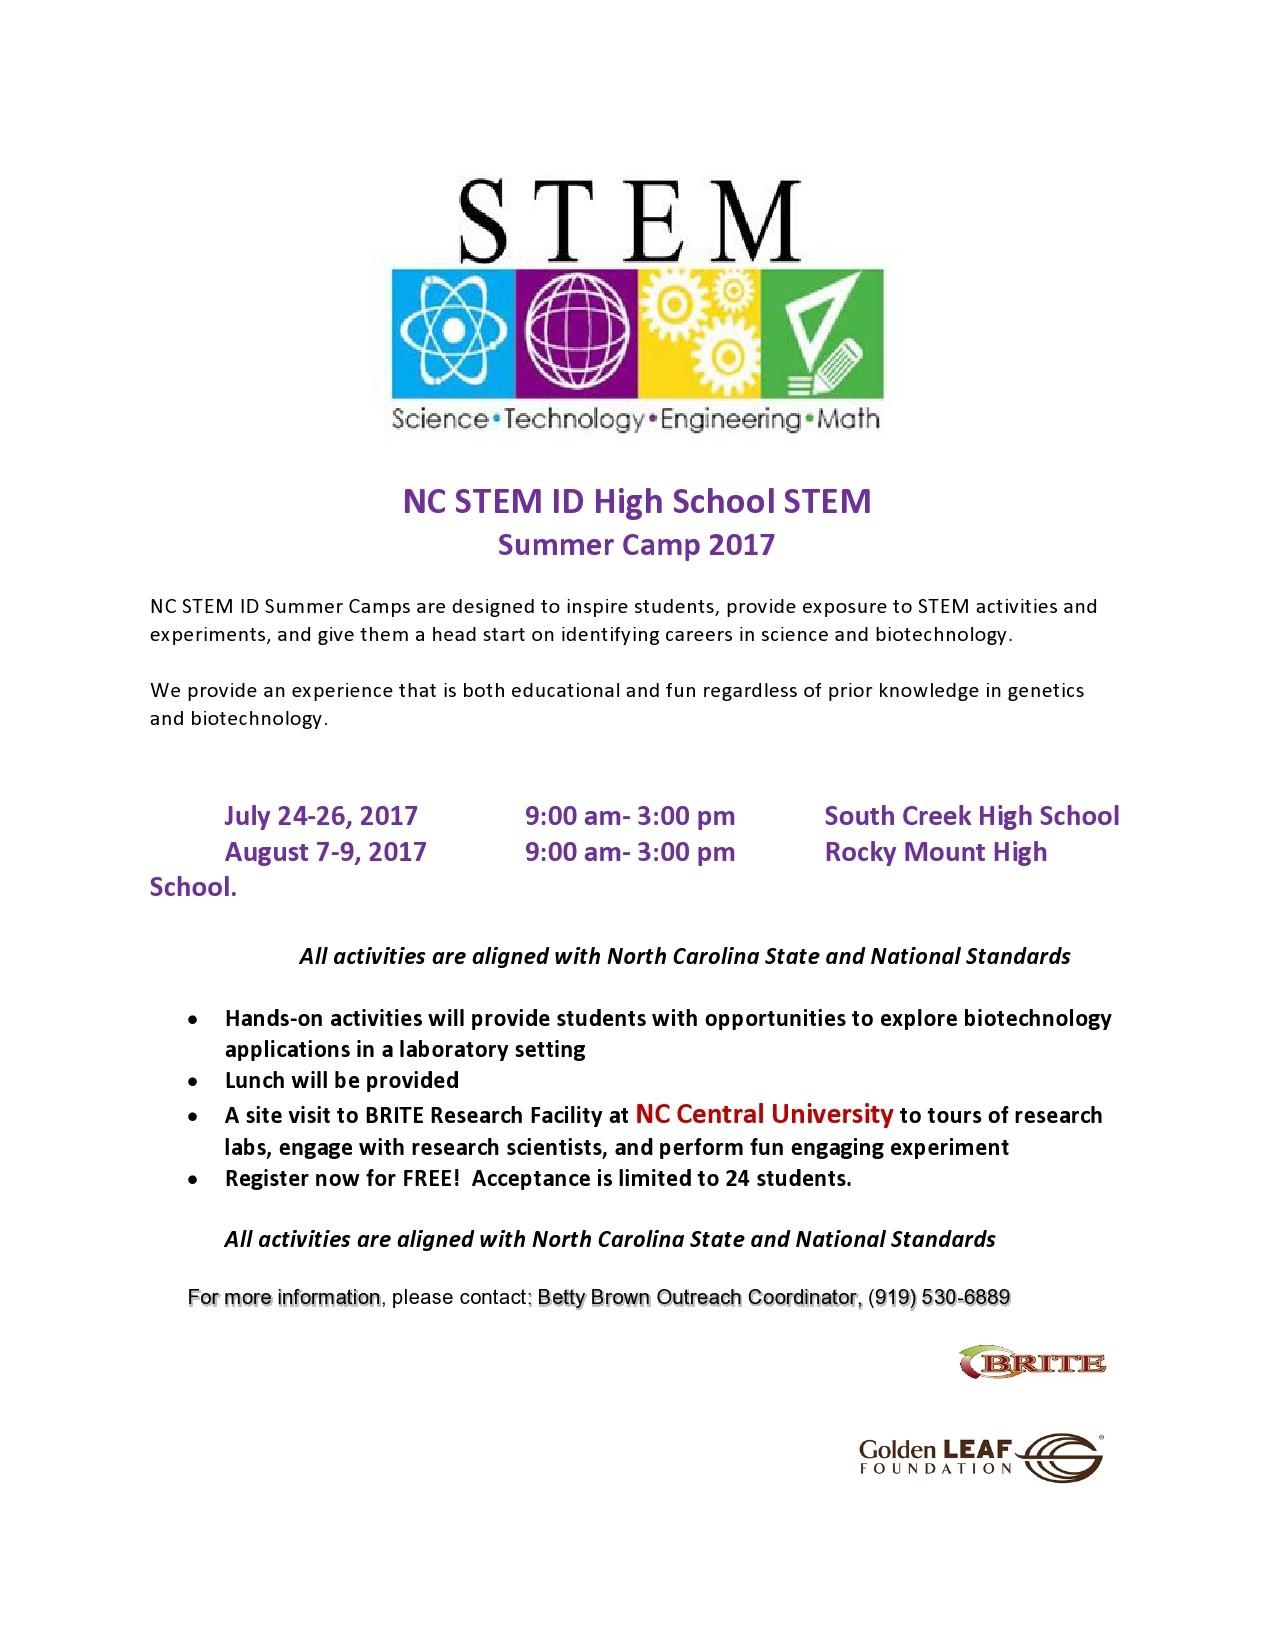 Free summer camp flyer 24